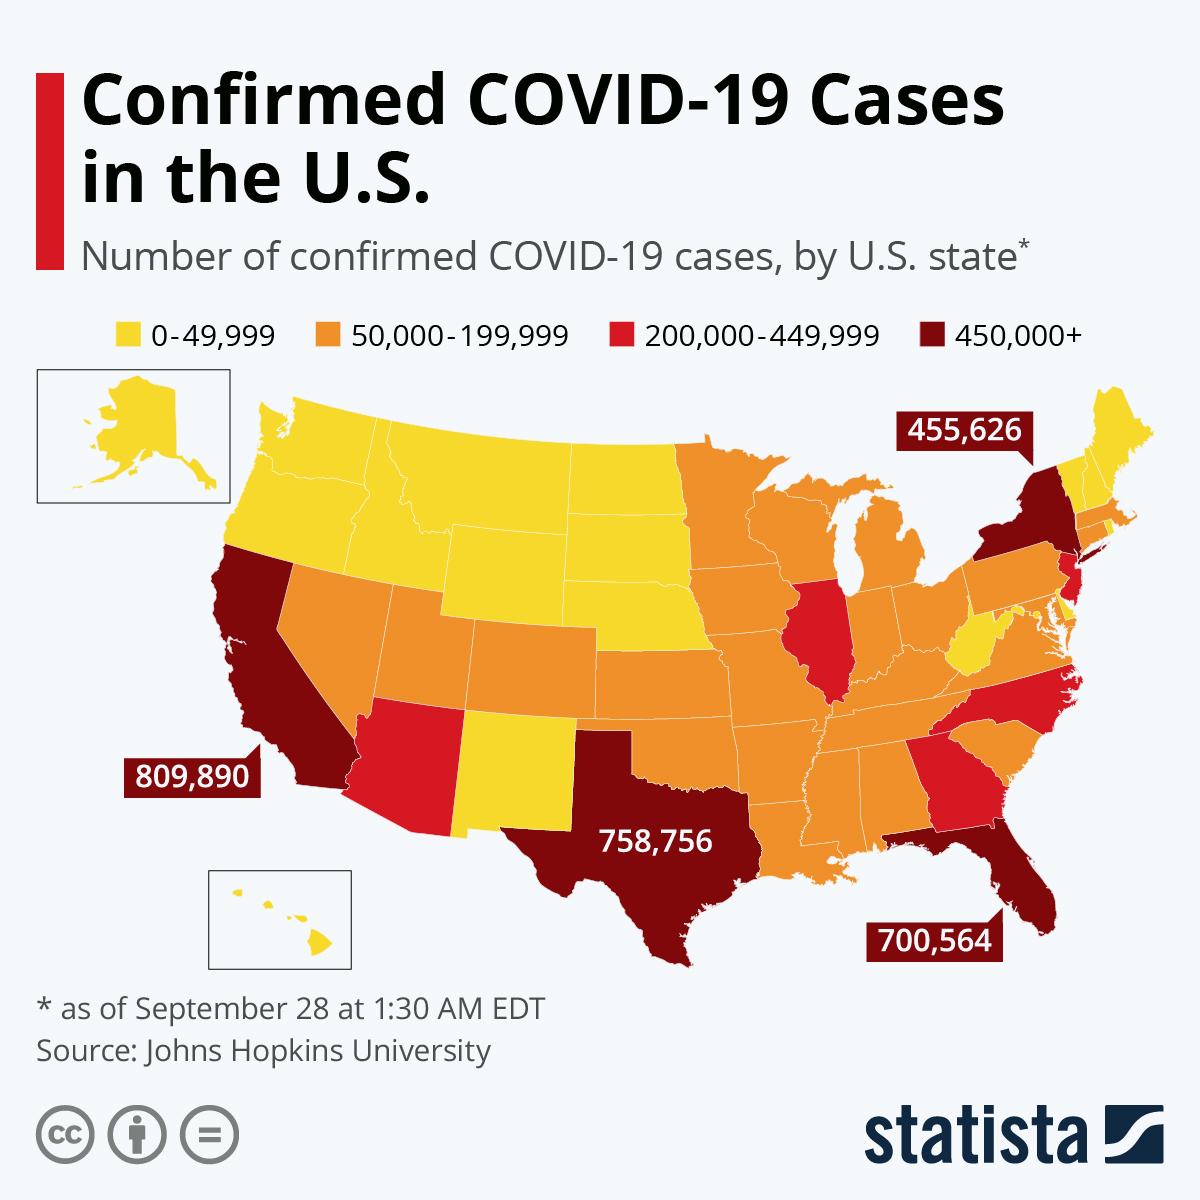 Confirmed COVID-19 Cases in the U.S. https://t.co/CxbqlNEwOz #tech #digital #data #business https://t.co/26SNJVpWWQ